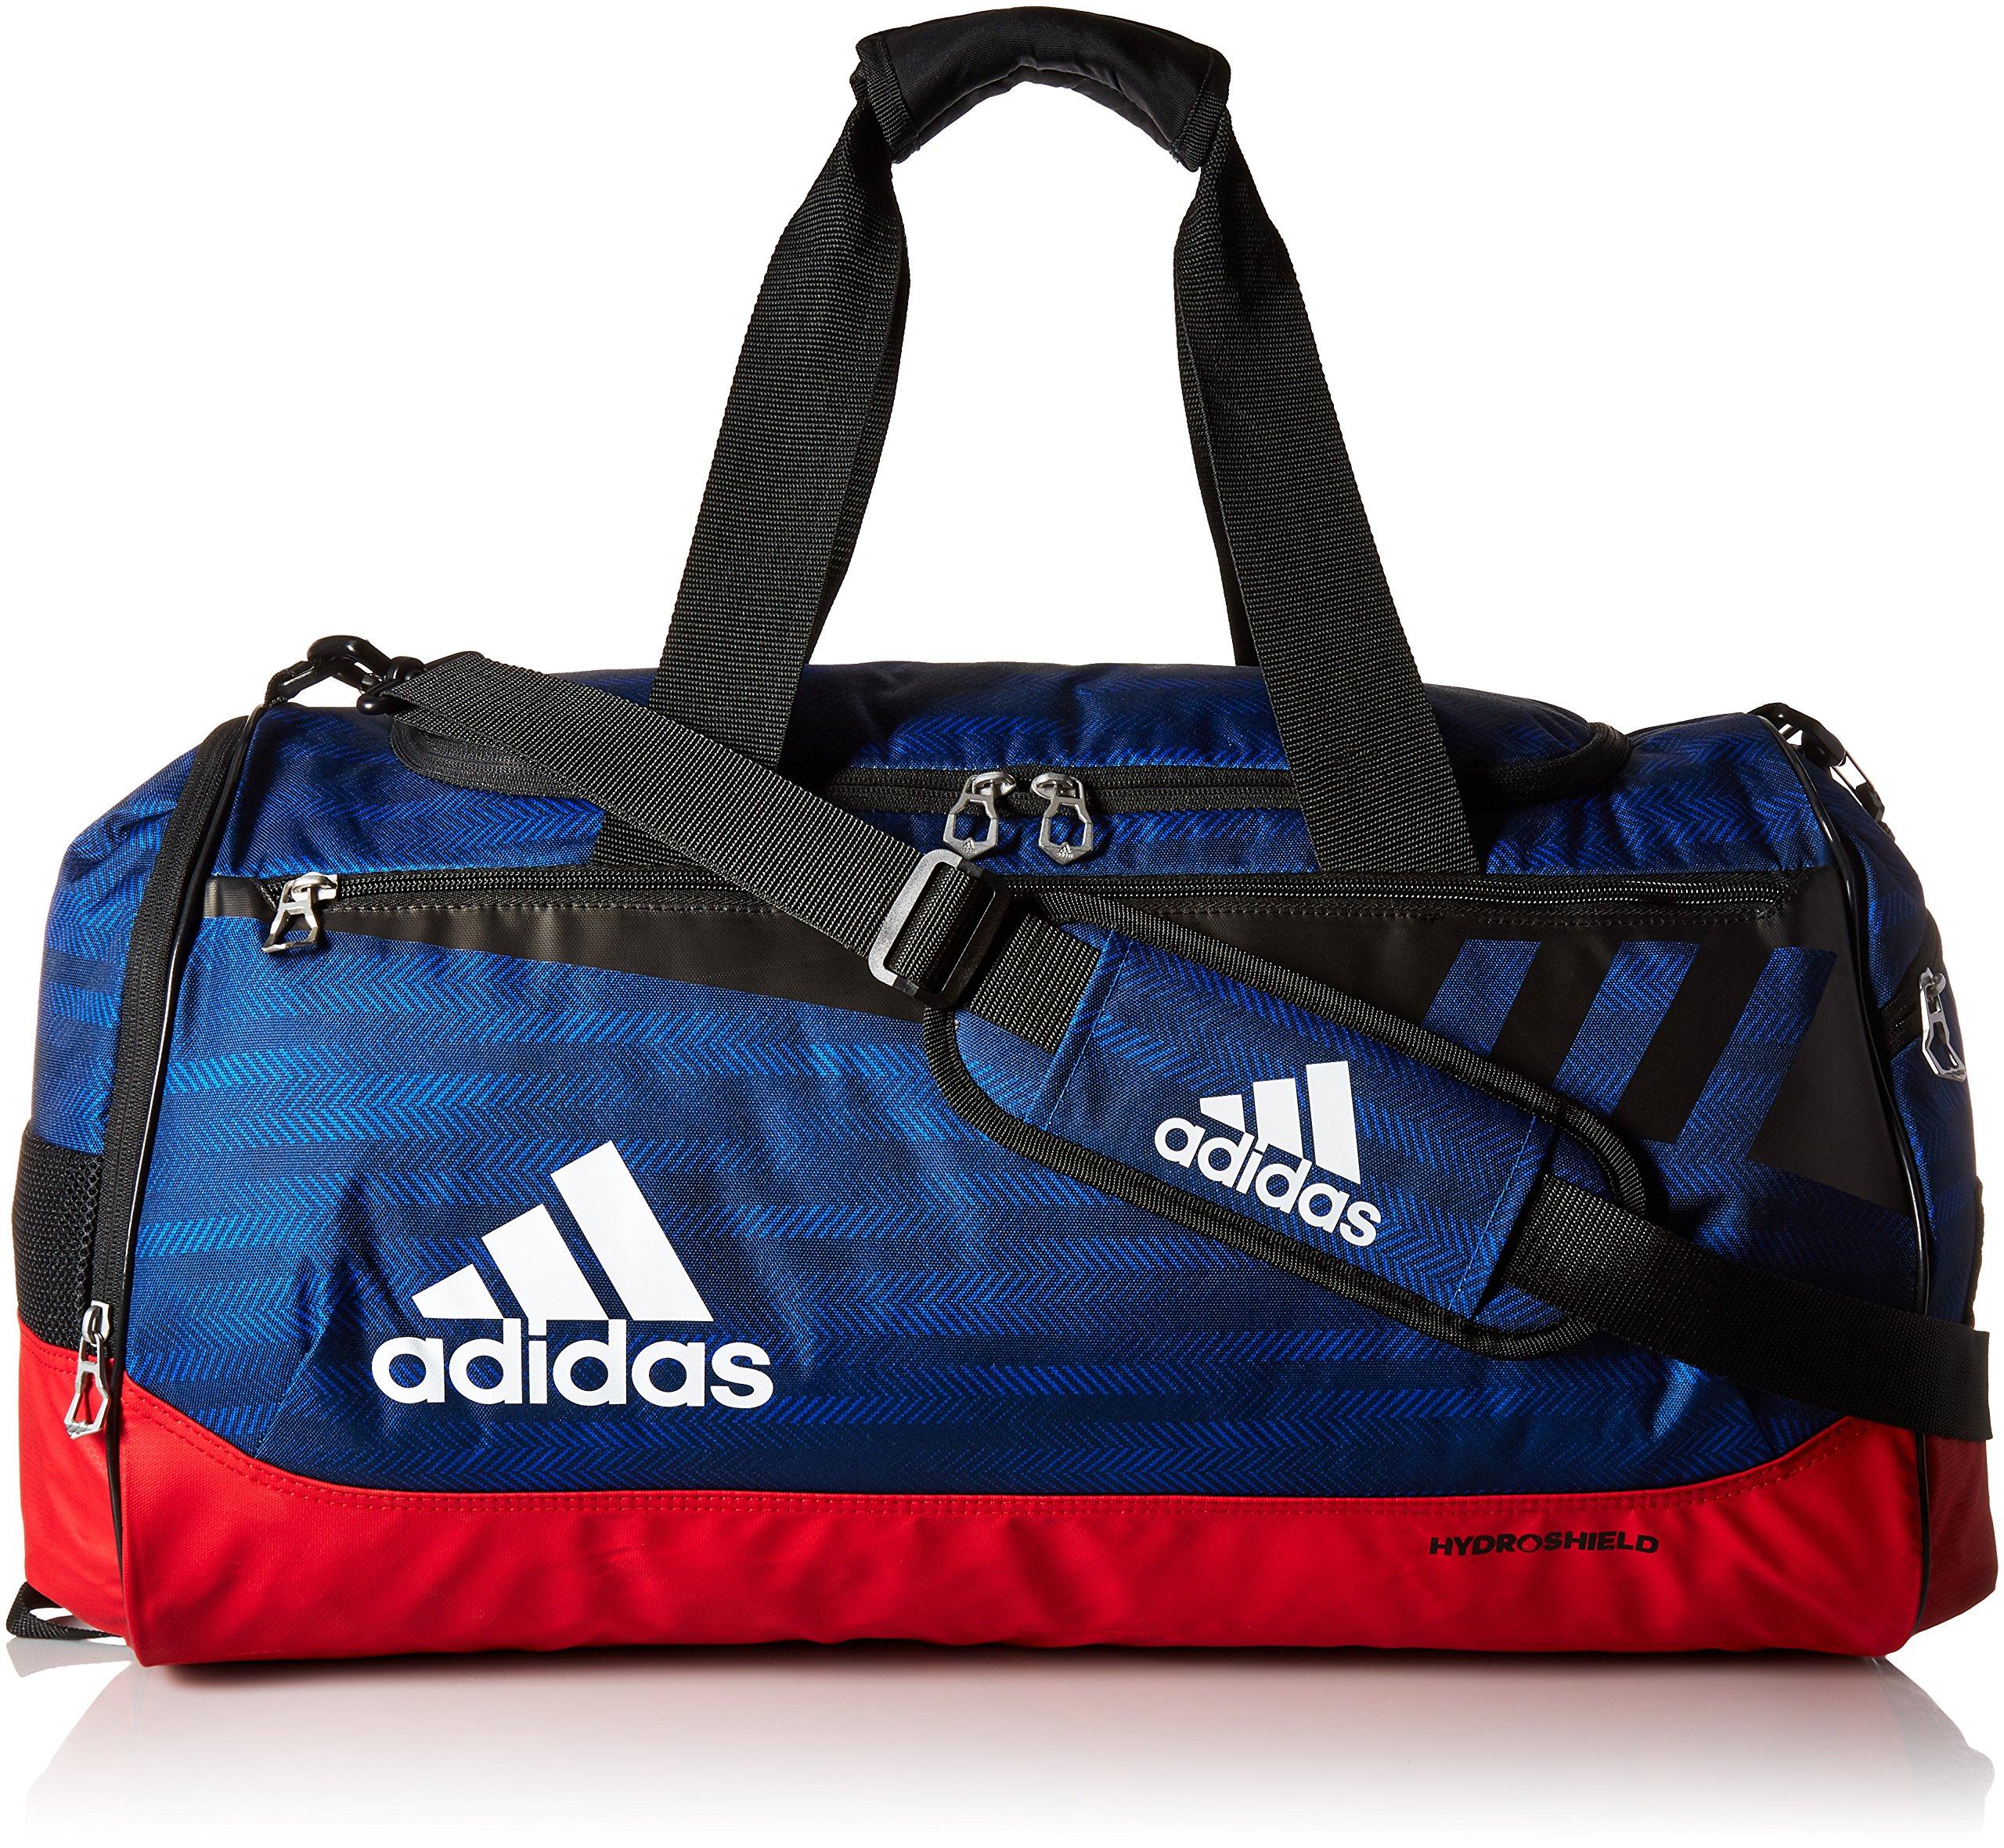 adidas Team Issue Duffel, Medium, Blue Ratio/Scarlet/Black/White